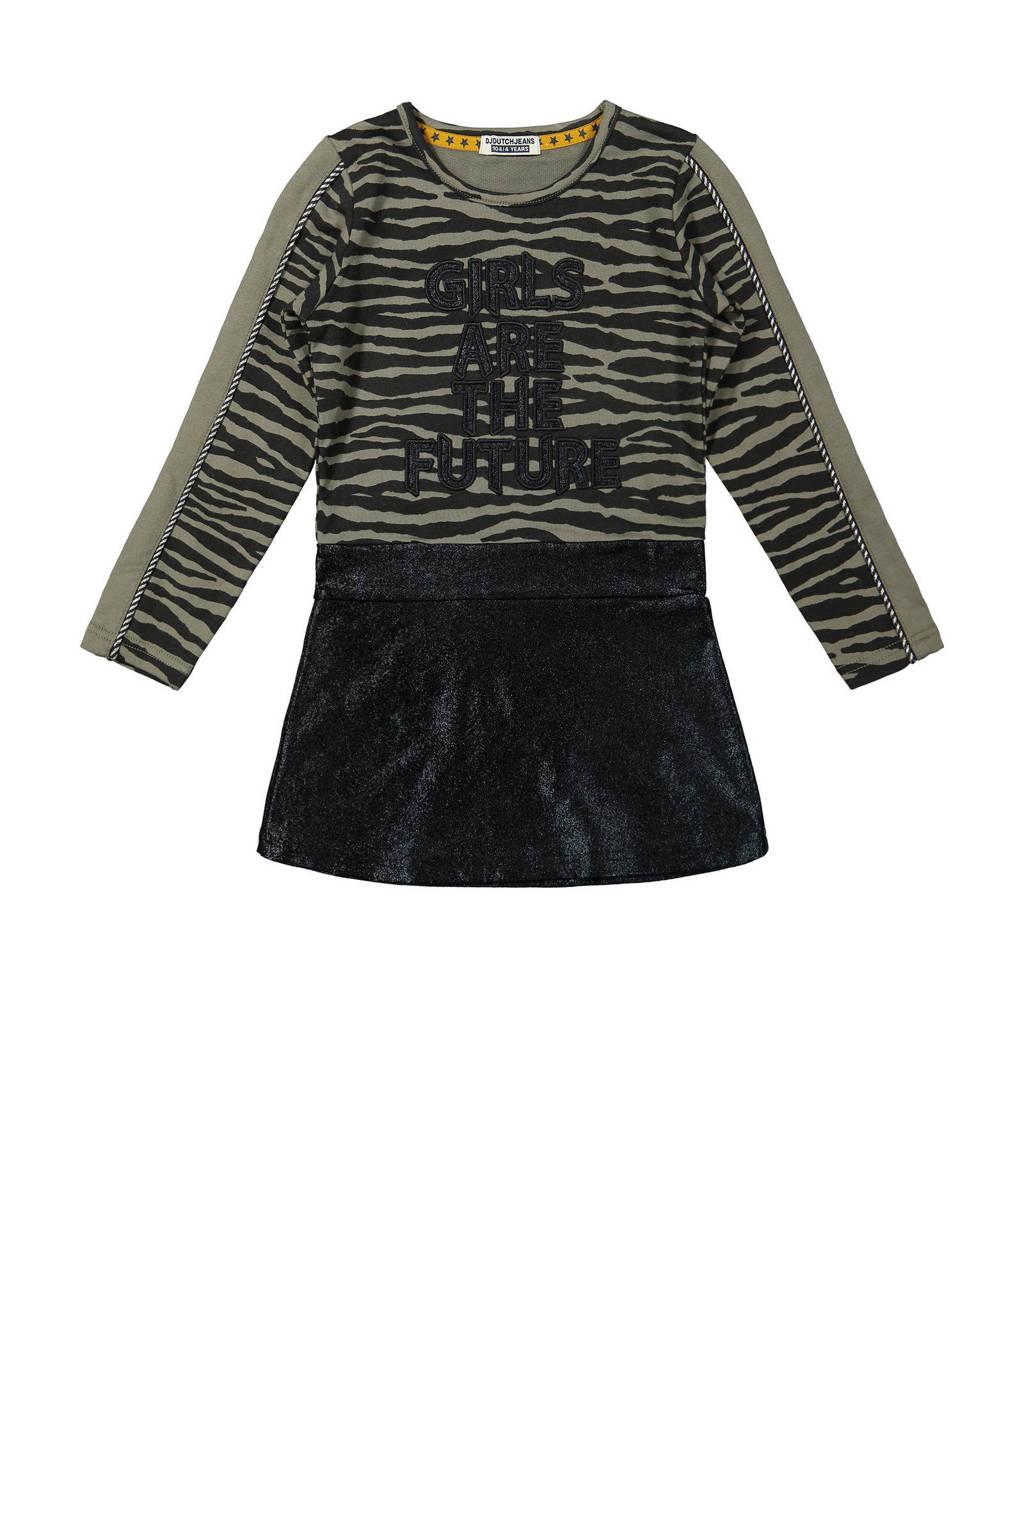 DJ Dutchjeans jurk met contrastbies army groen/zwart, Army groen/zwart